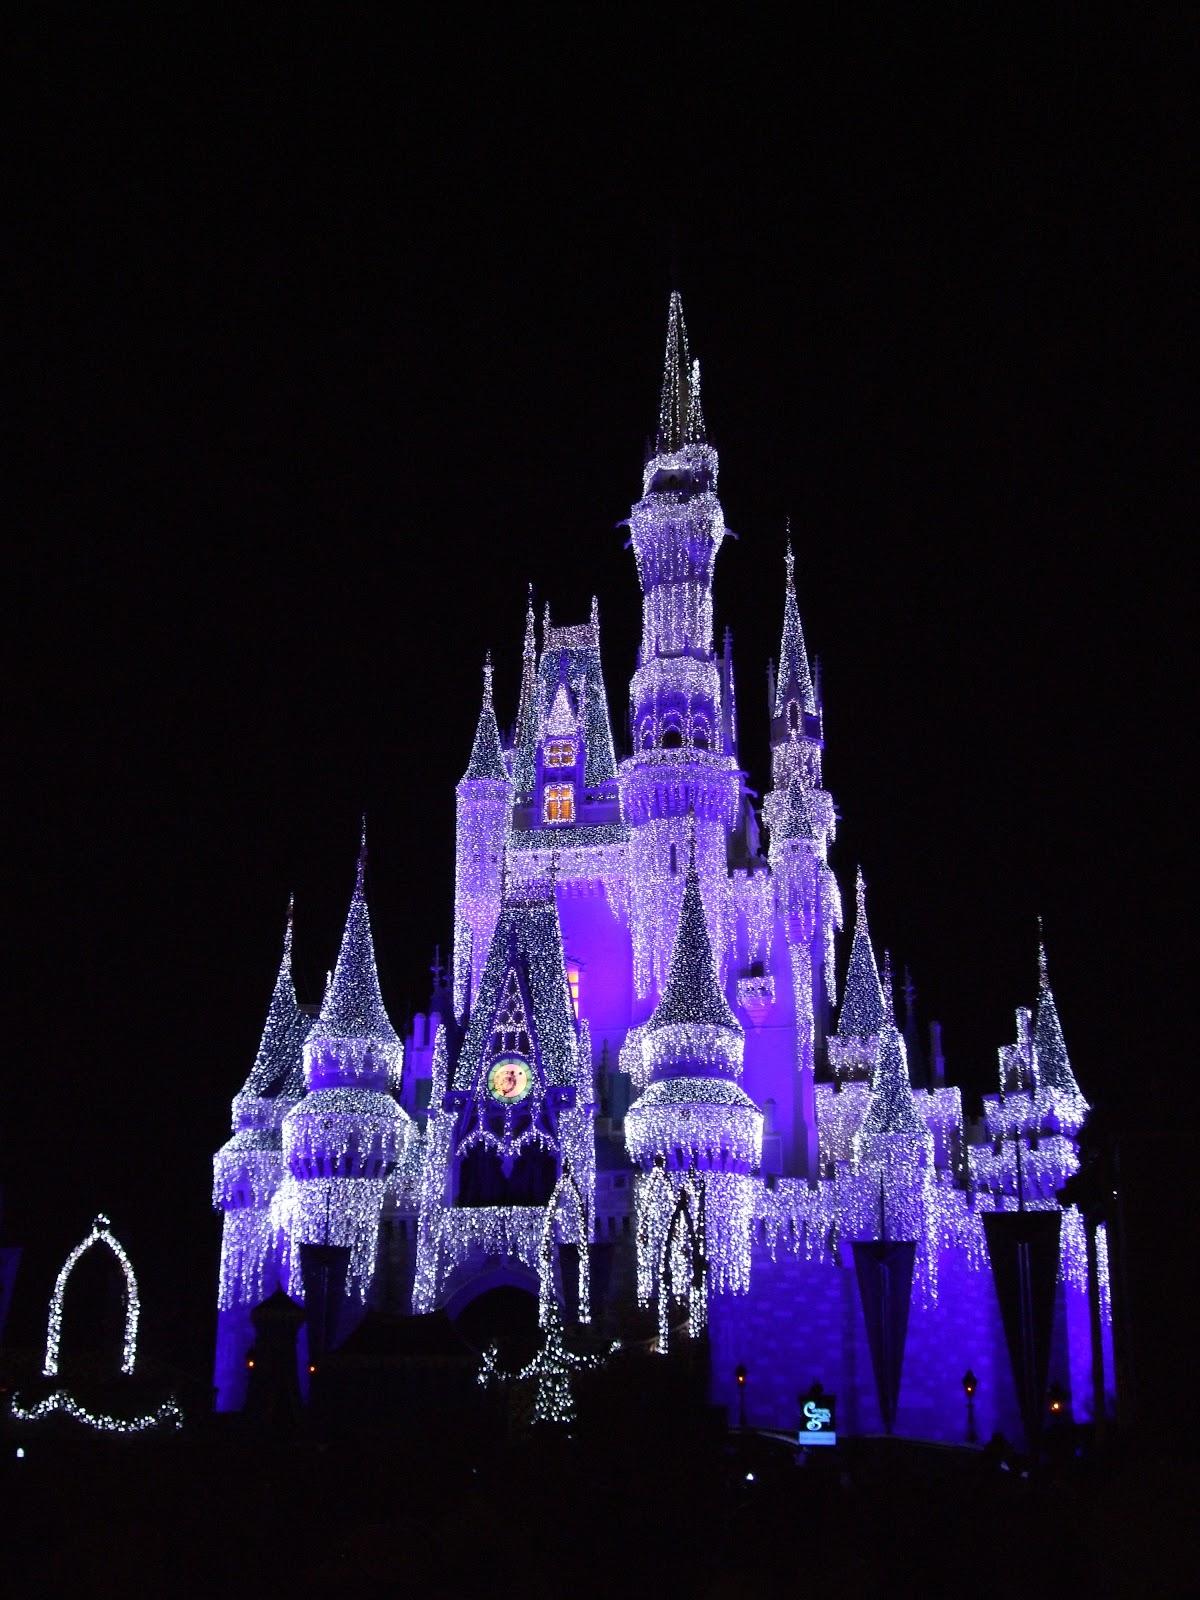 Cinderella Castle Christmas.Digital Disney World Ddw Pic 88 Cinderella Castle Christmas